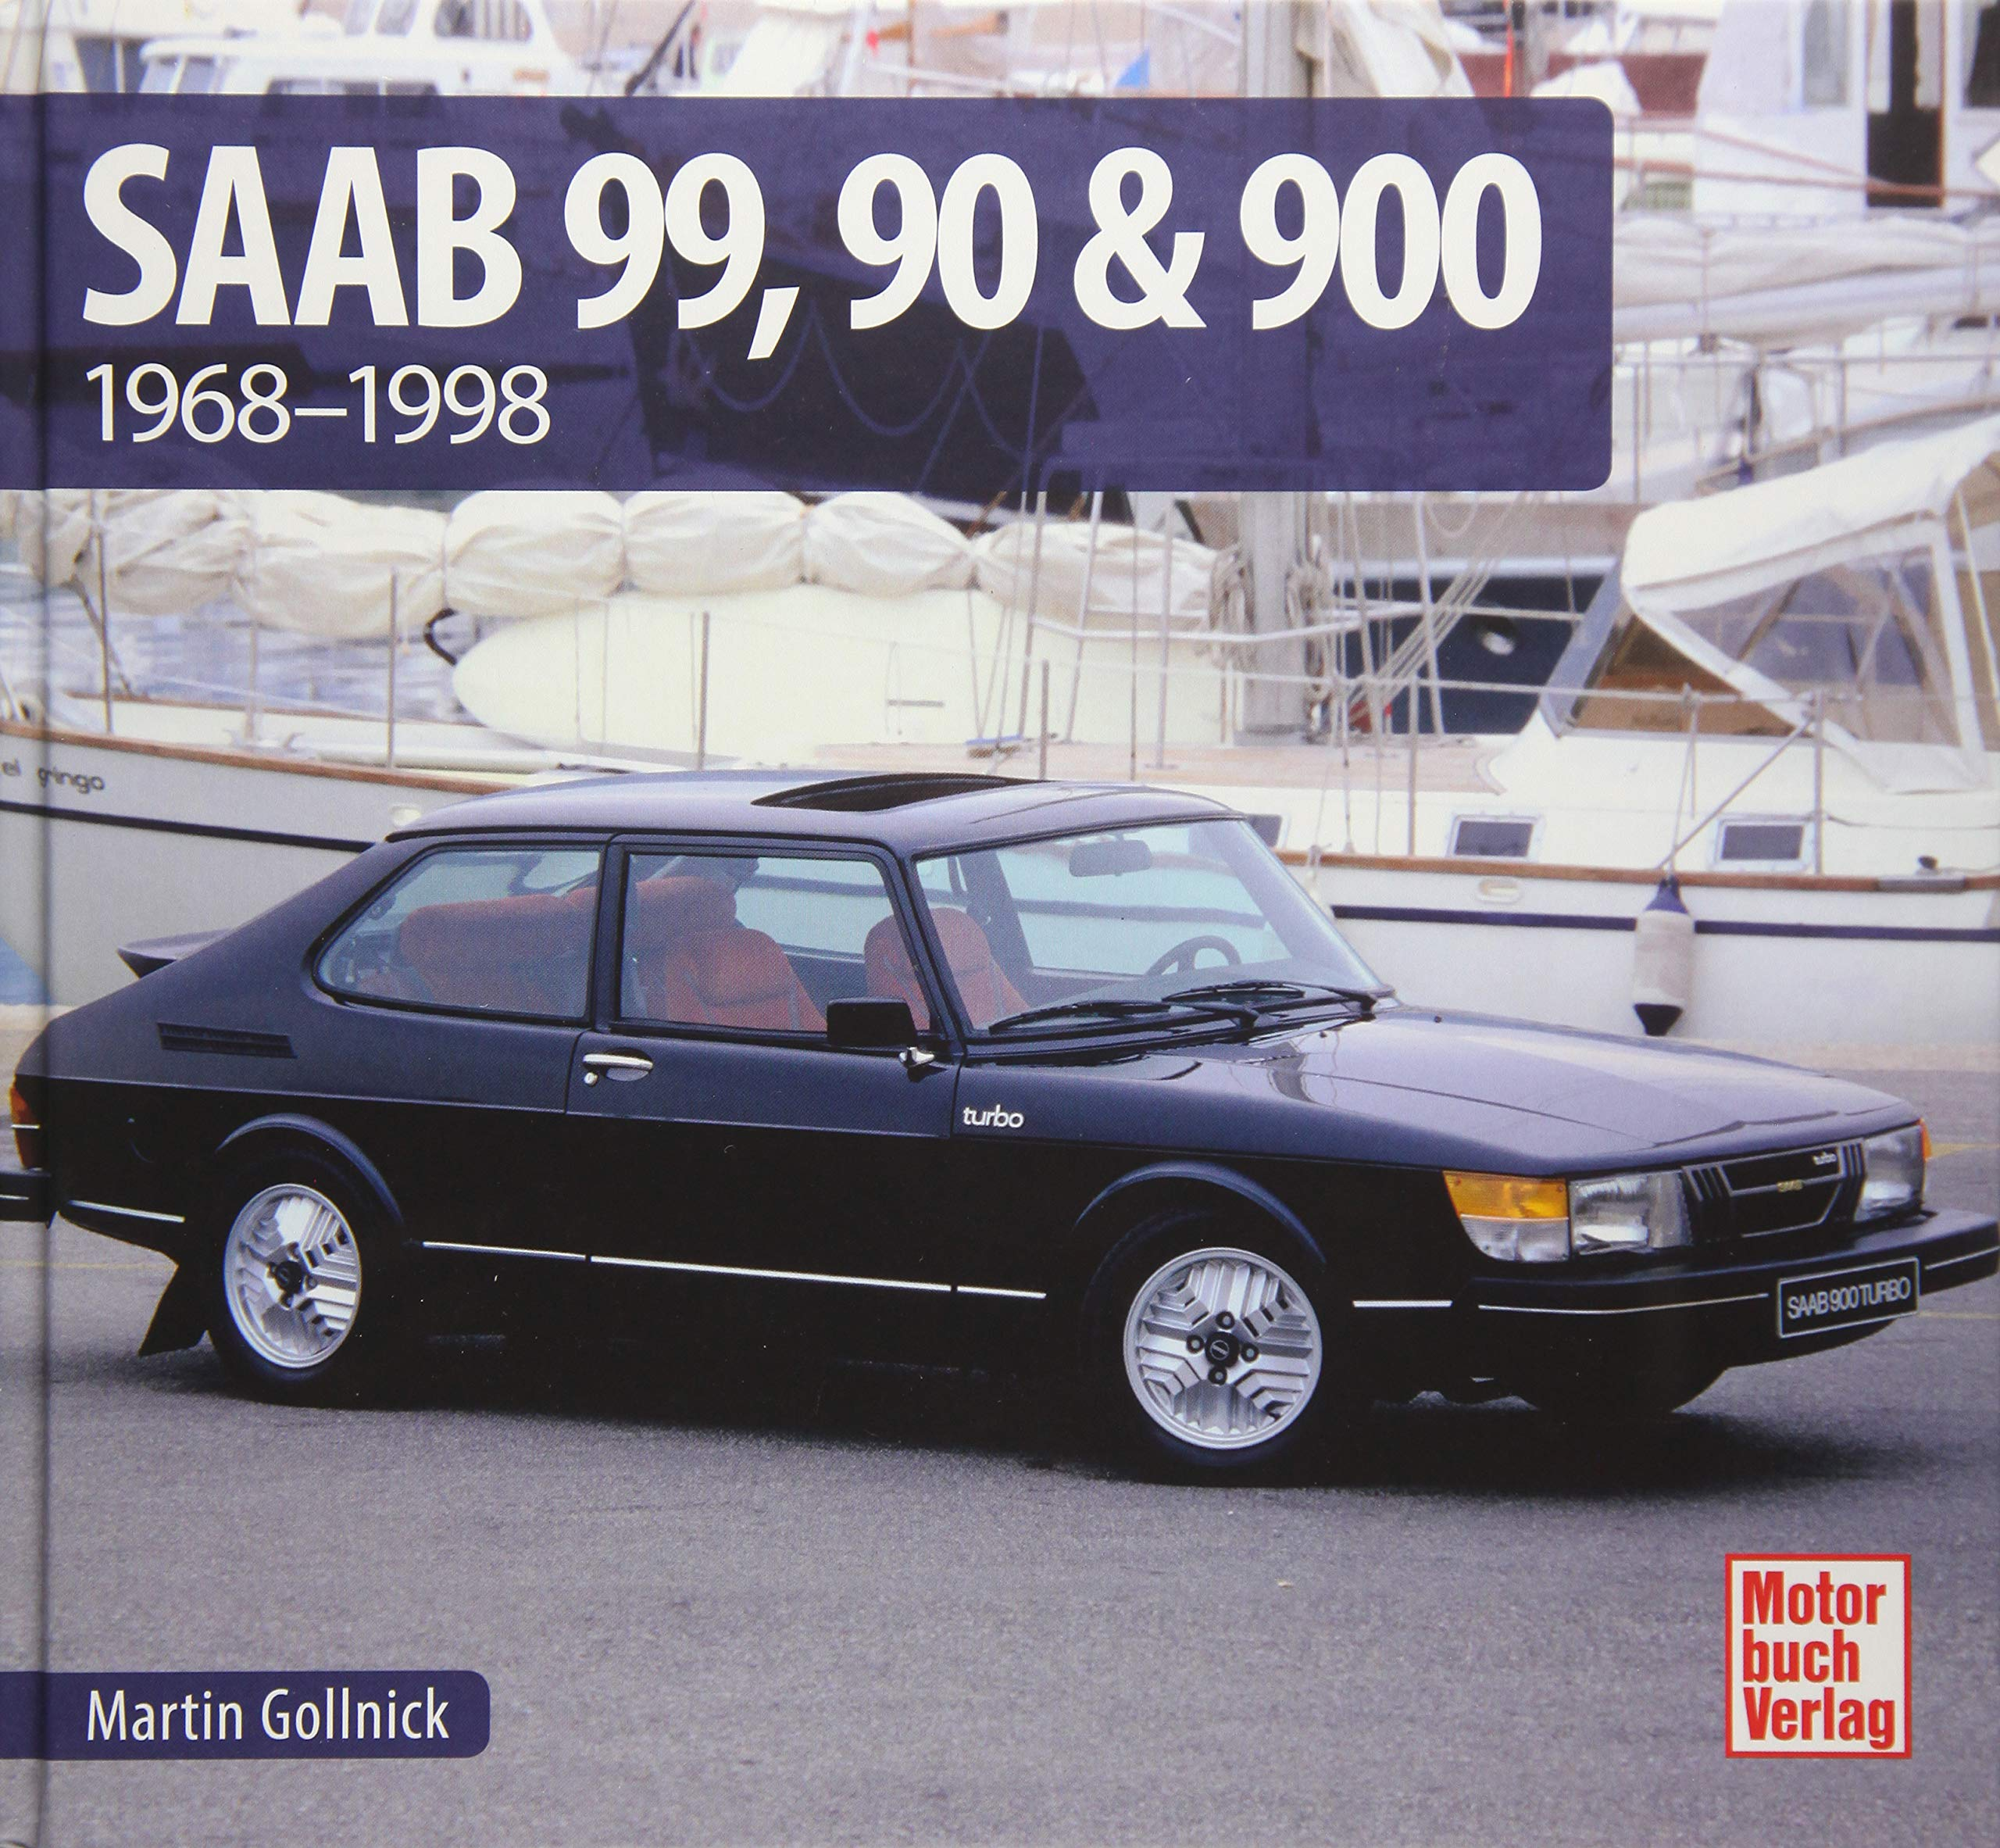 Saab 99, 90 & 900: 1968 - 1998: Amazon.es: Martin Gollnick: Libros en idiomas extranjeros